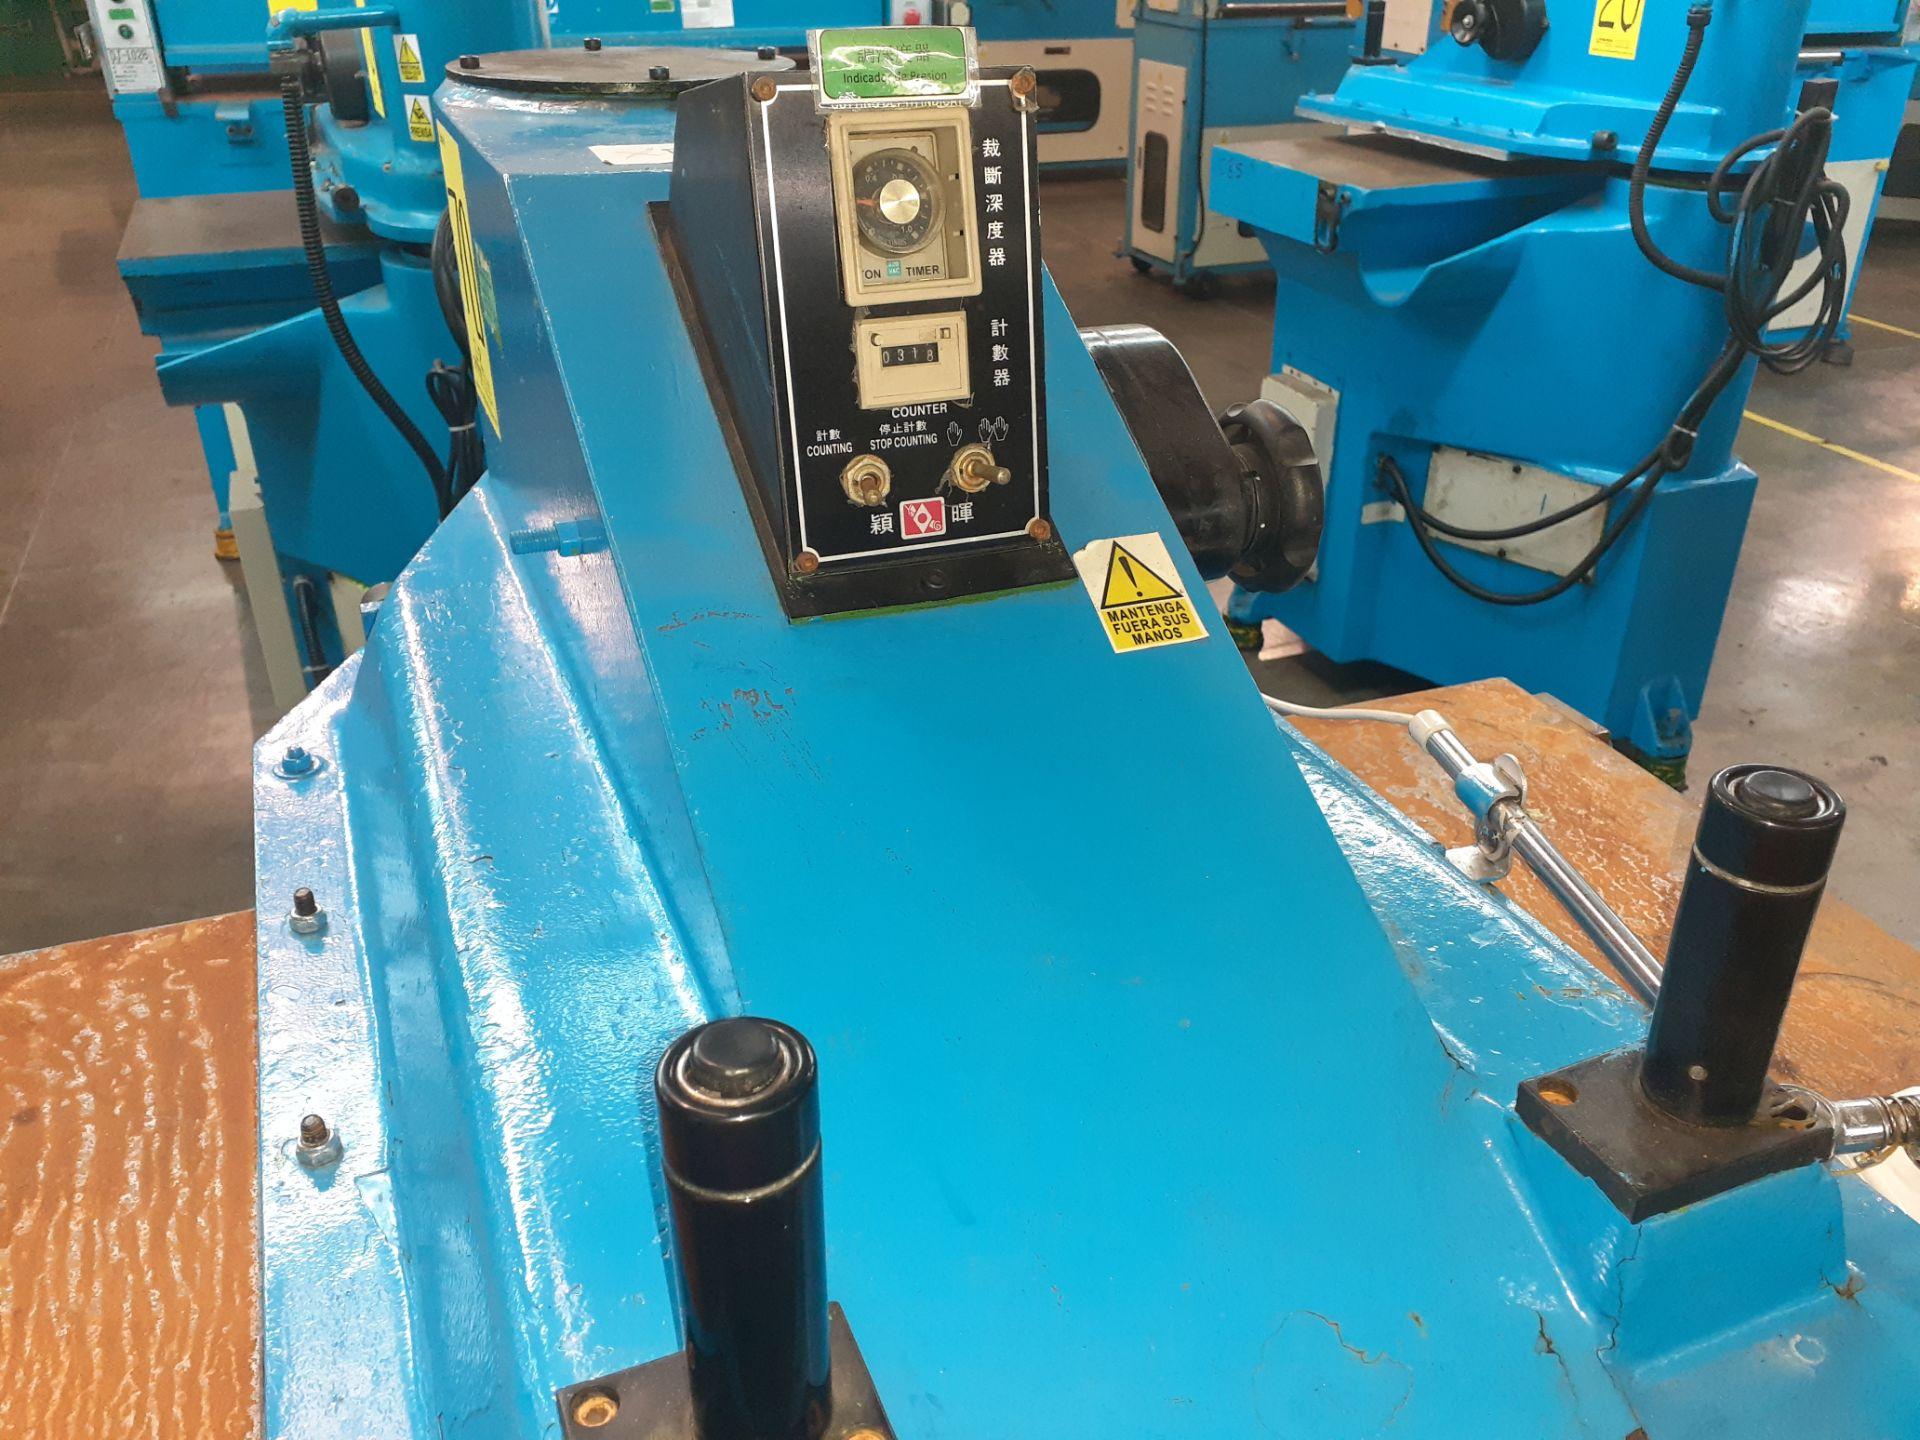 Lot 70 - (2) Prensas de corte hidráulica de brazo oscilante, marca Ying Hui Machine, Modelo: YG-520